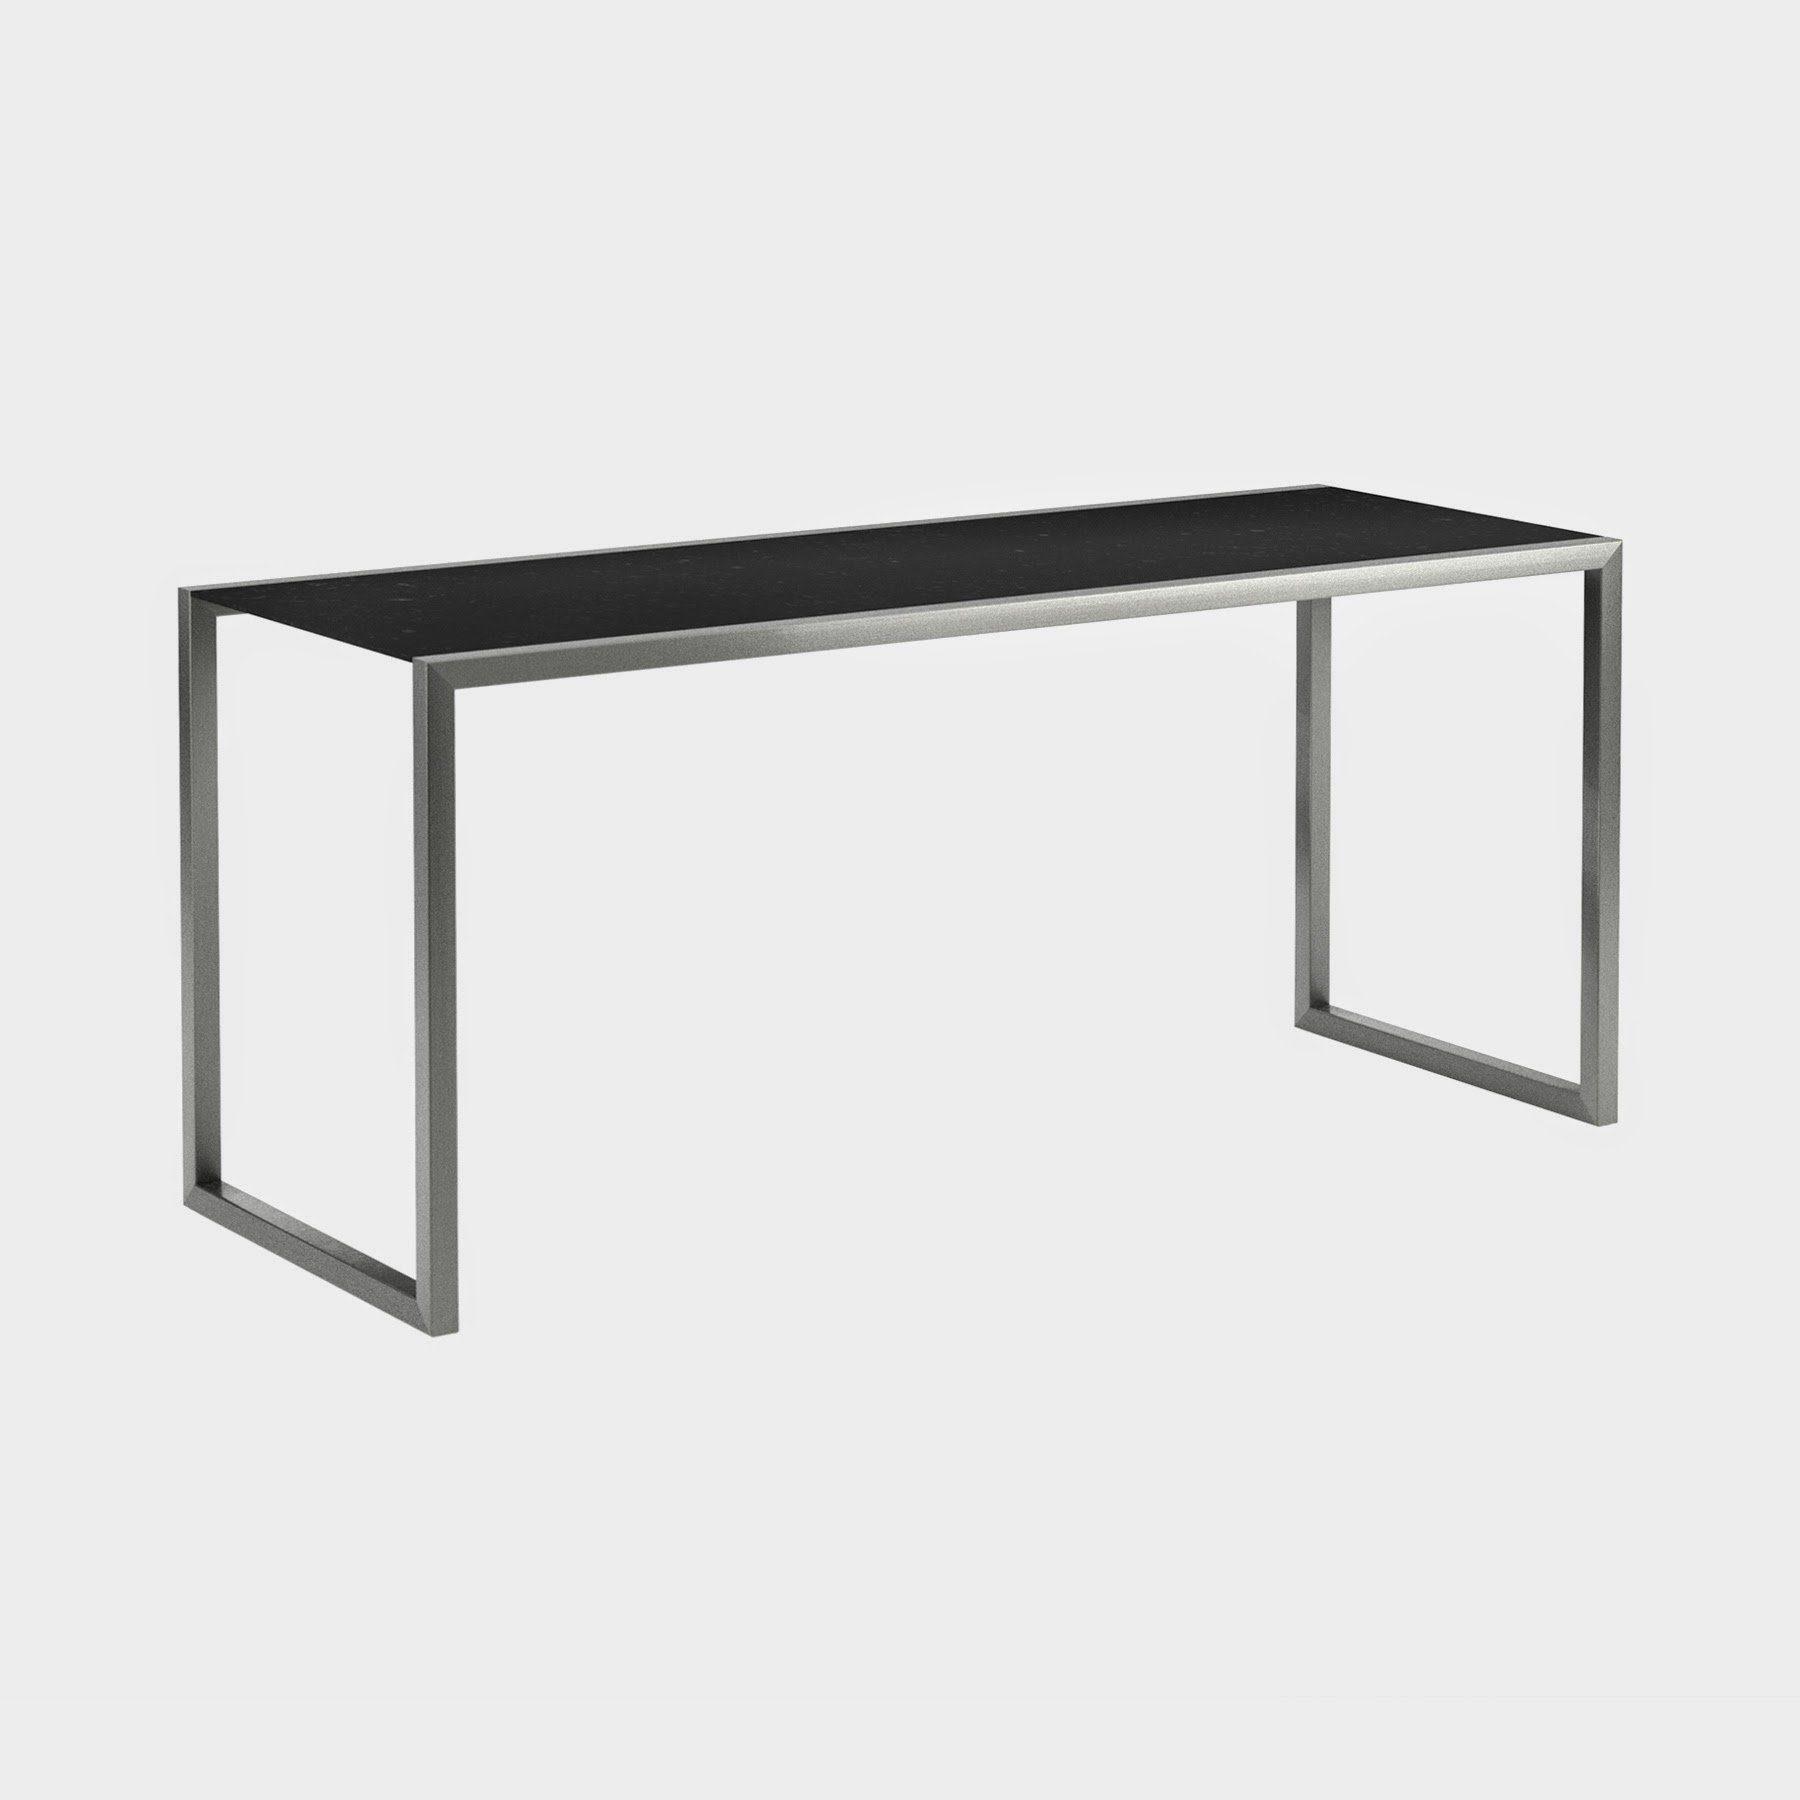 royal botania ninix 240h bartisch. Black Bedroom Furniture Sets. Home Design Ideas